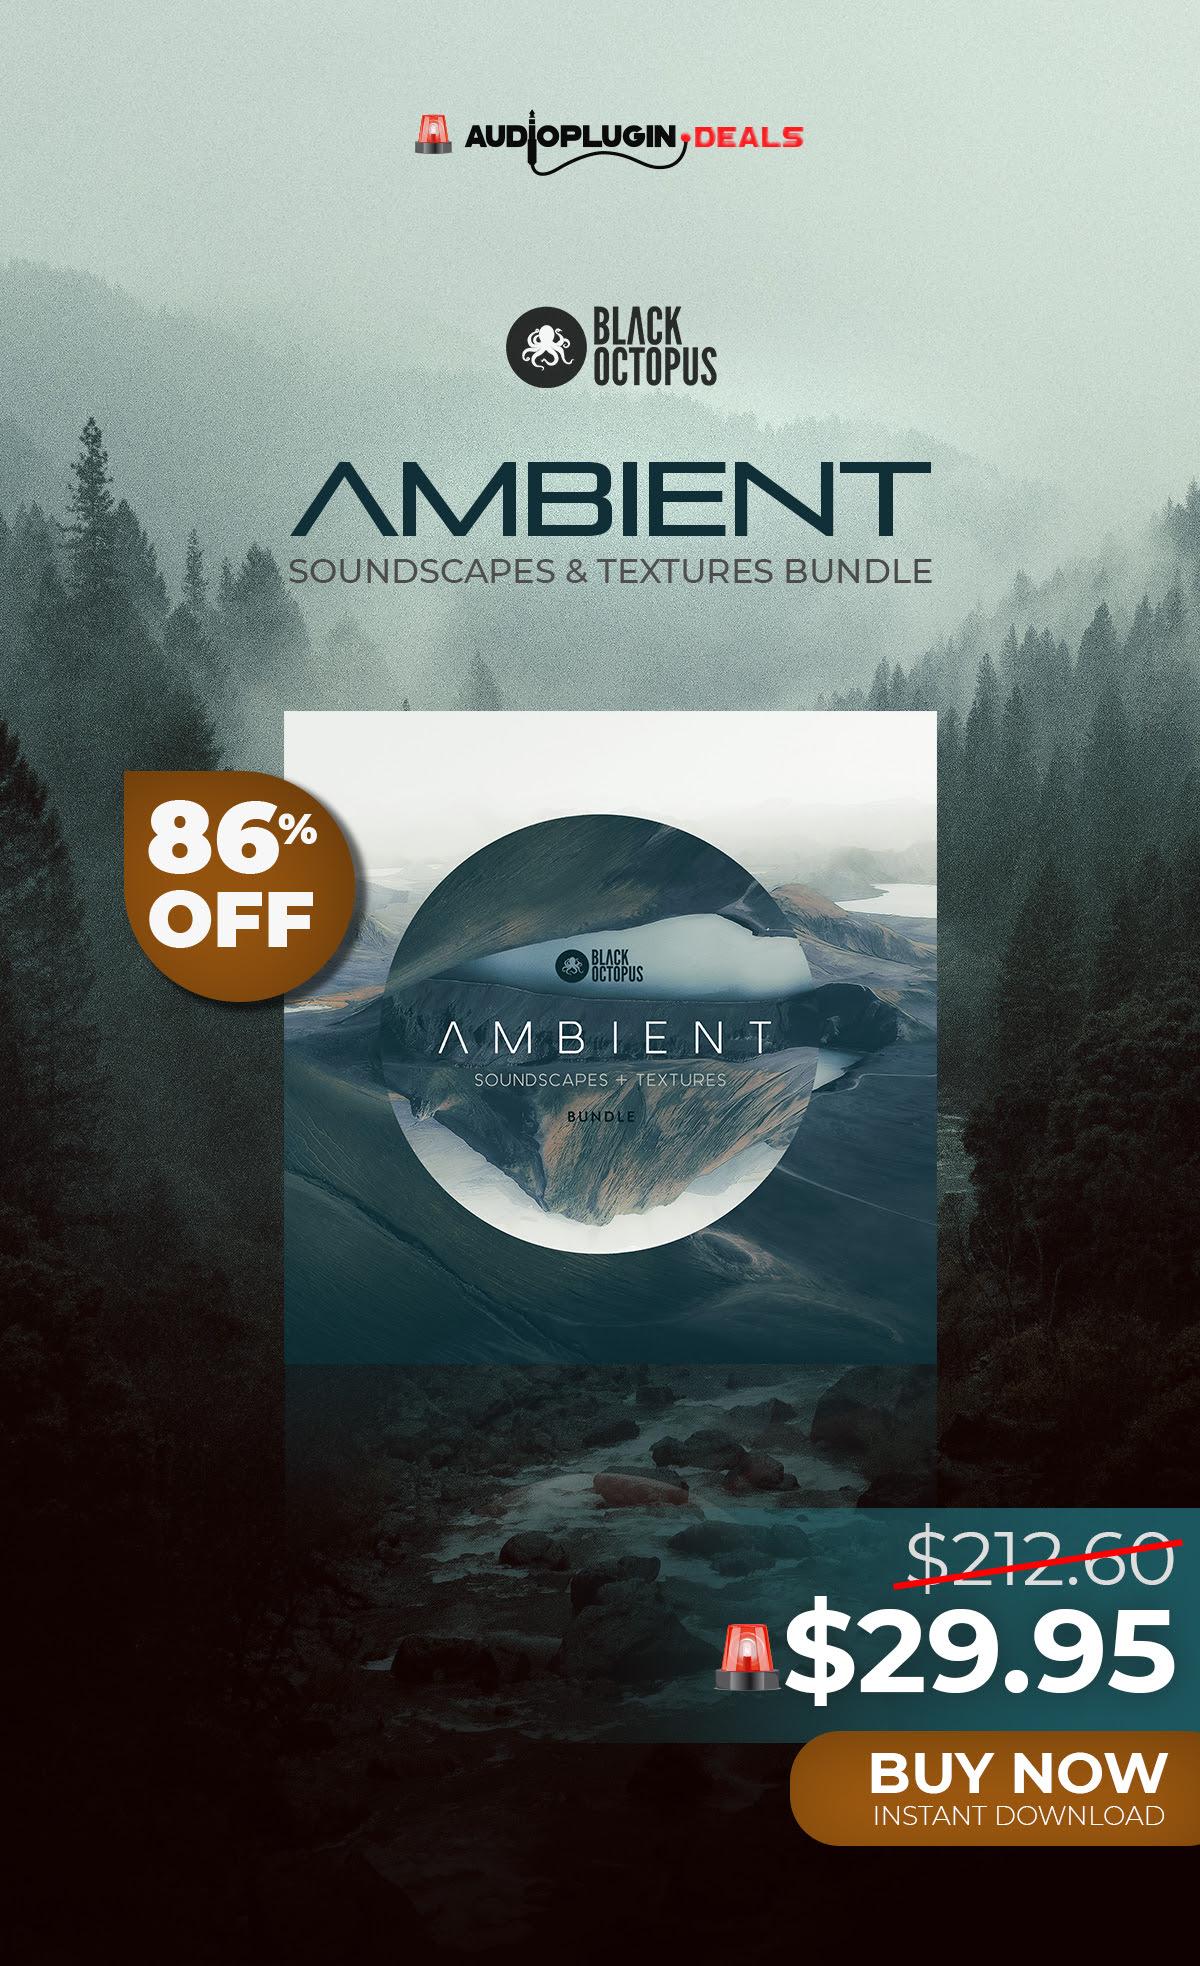 86% DISOCUNT on Ambient Soundscapes & Textures Bundle by Black Octopus.